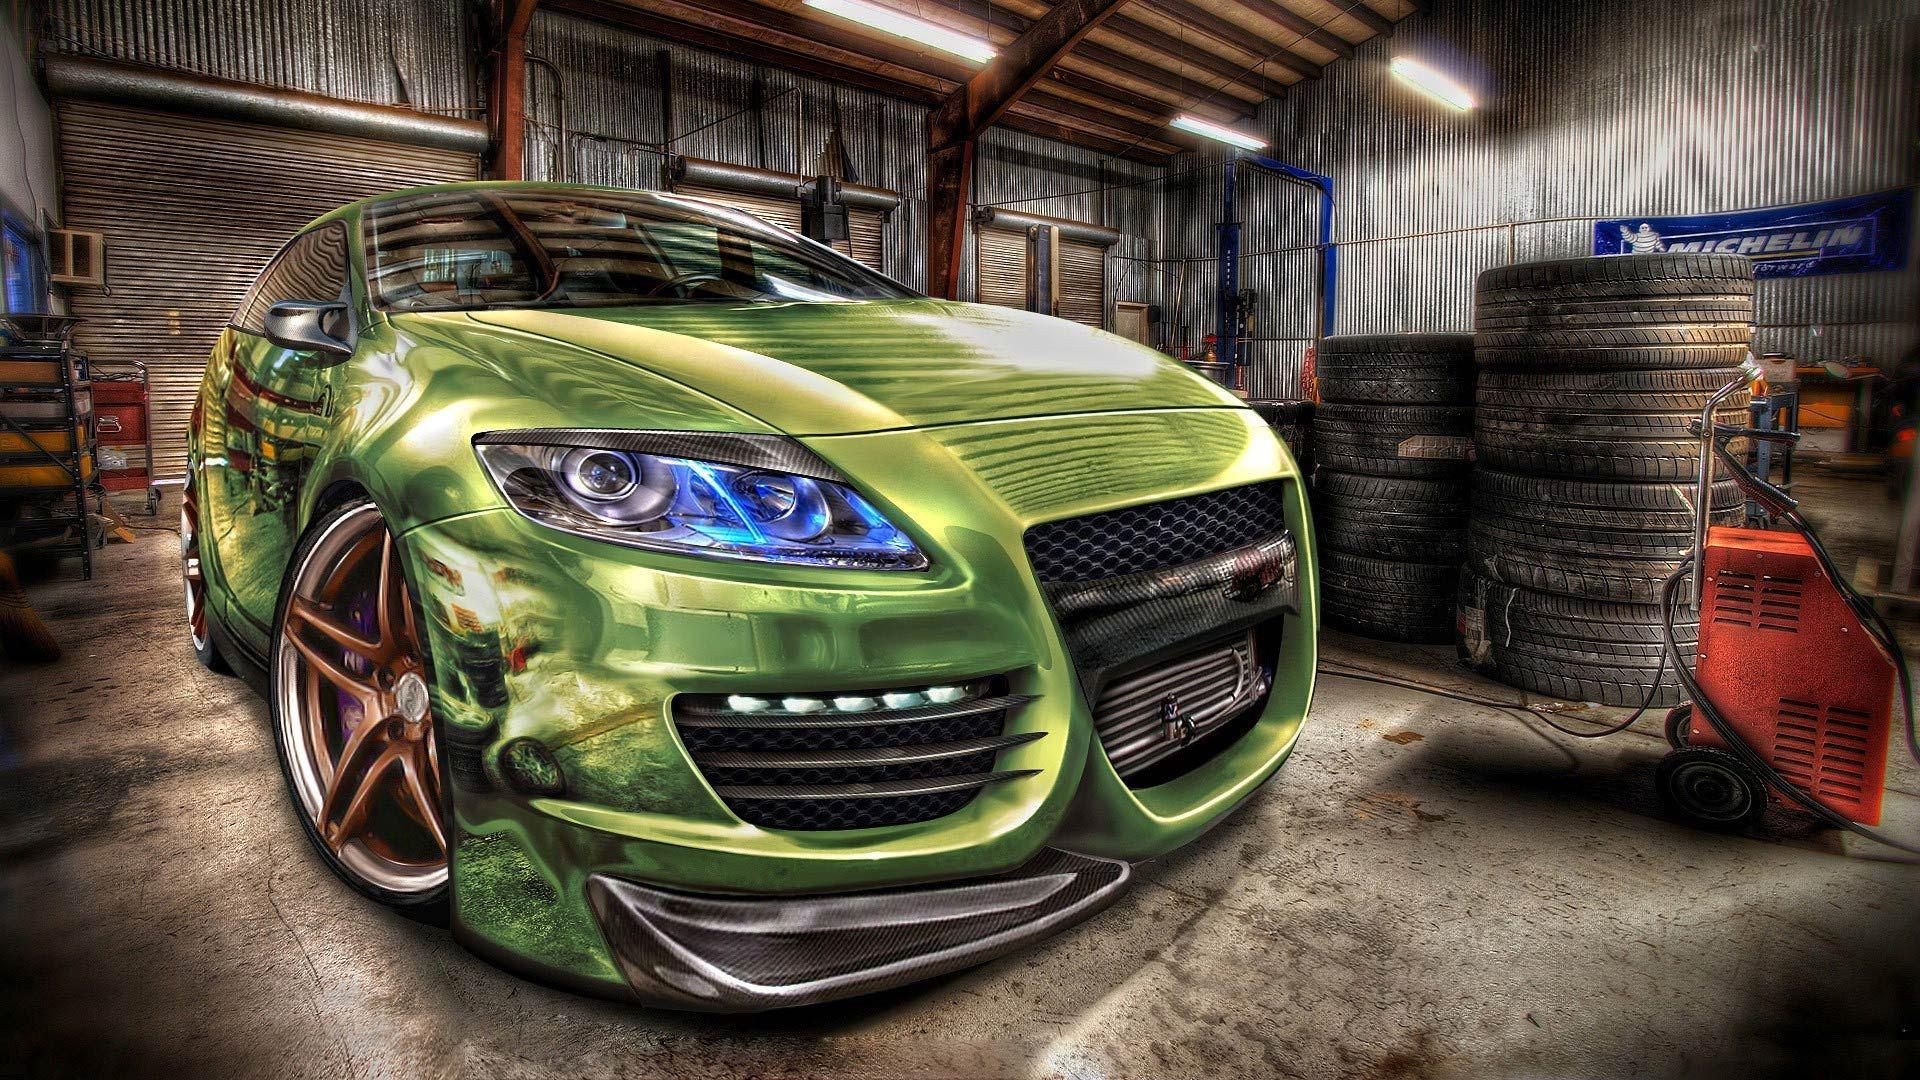 Garage hd wallpaper 1080